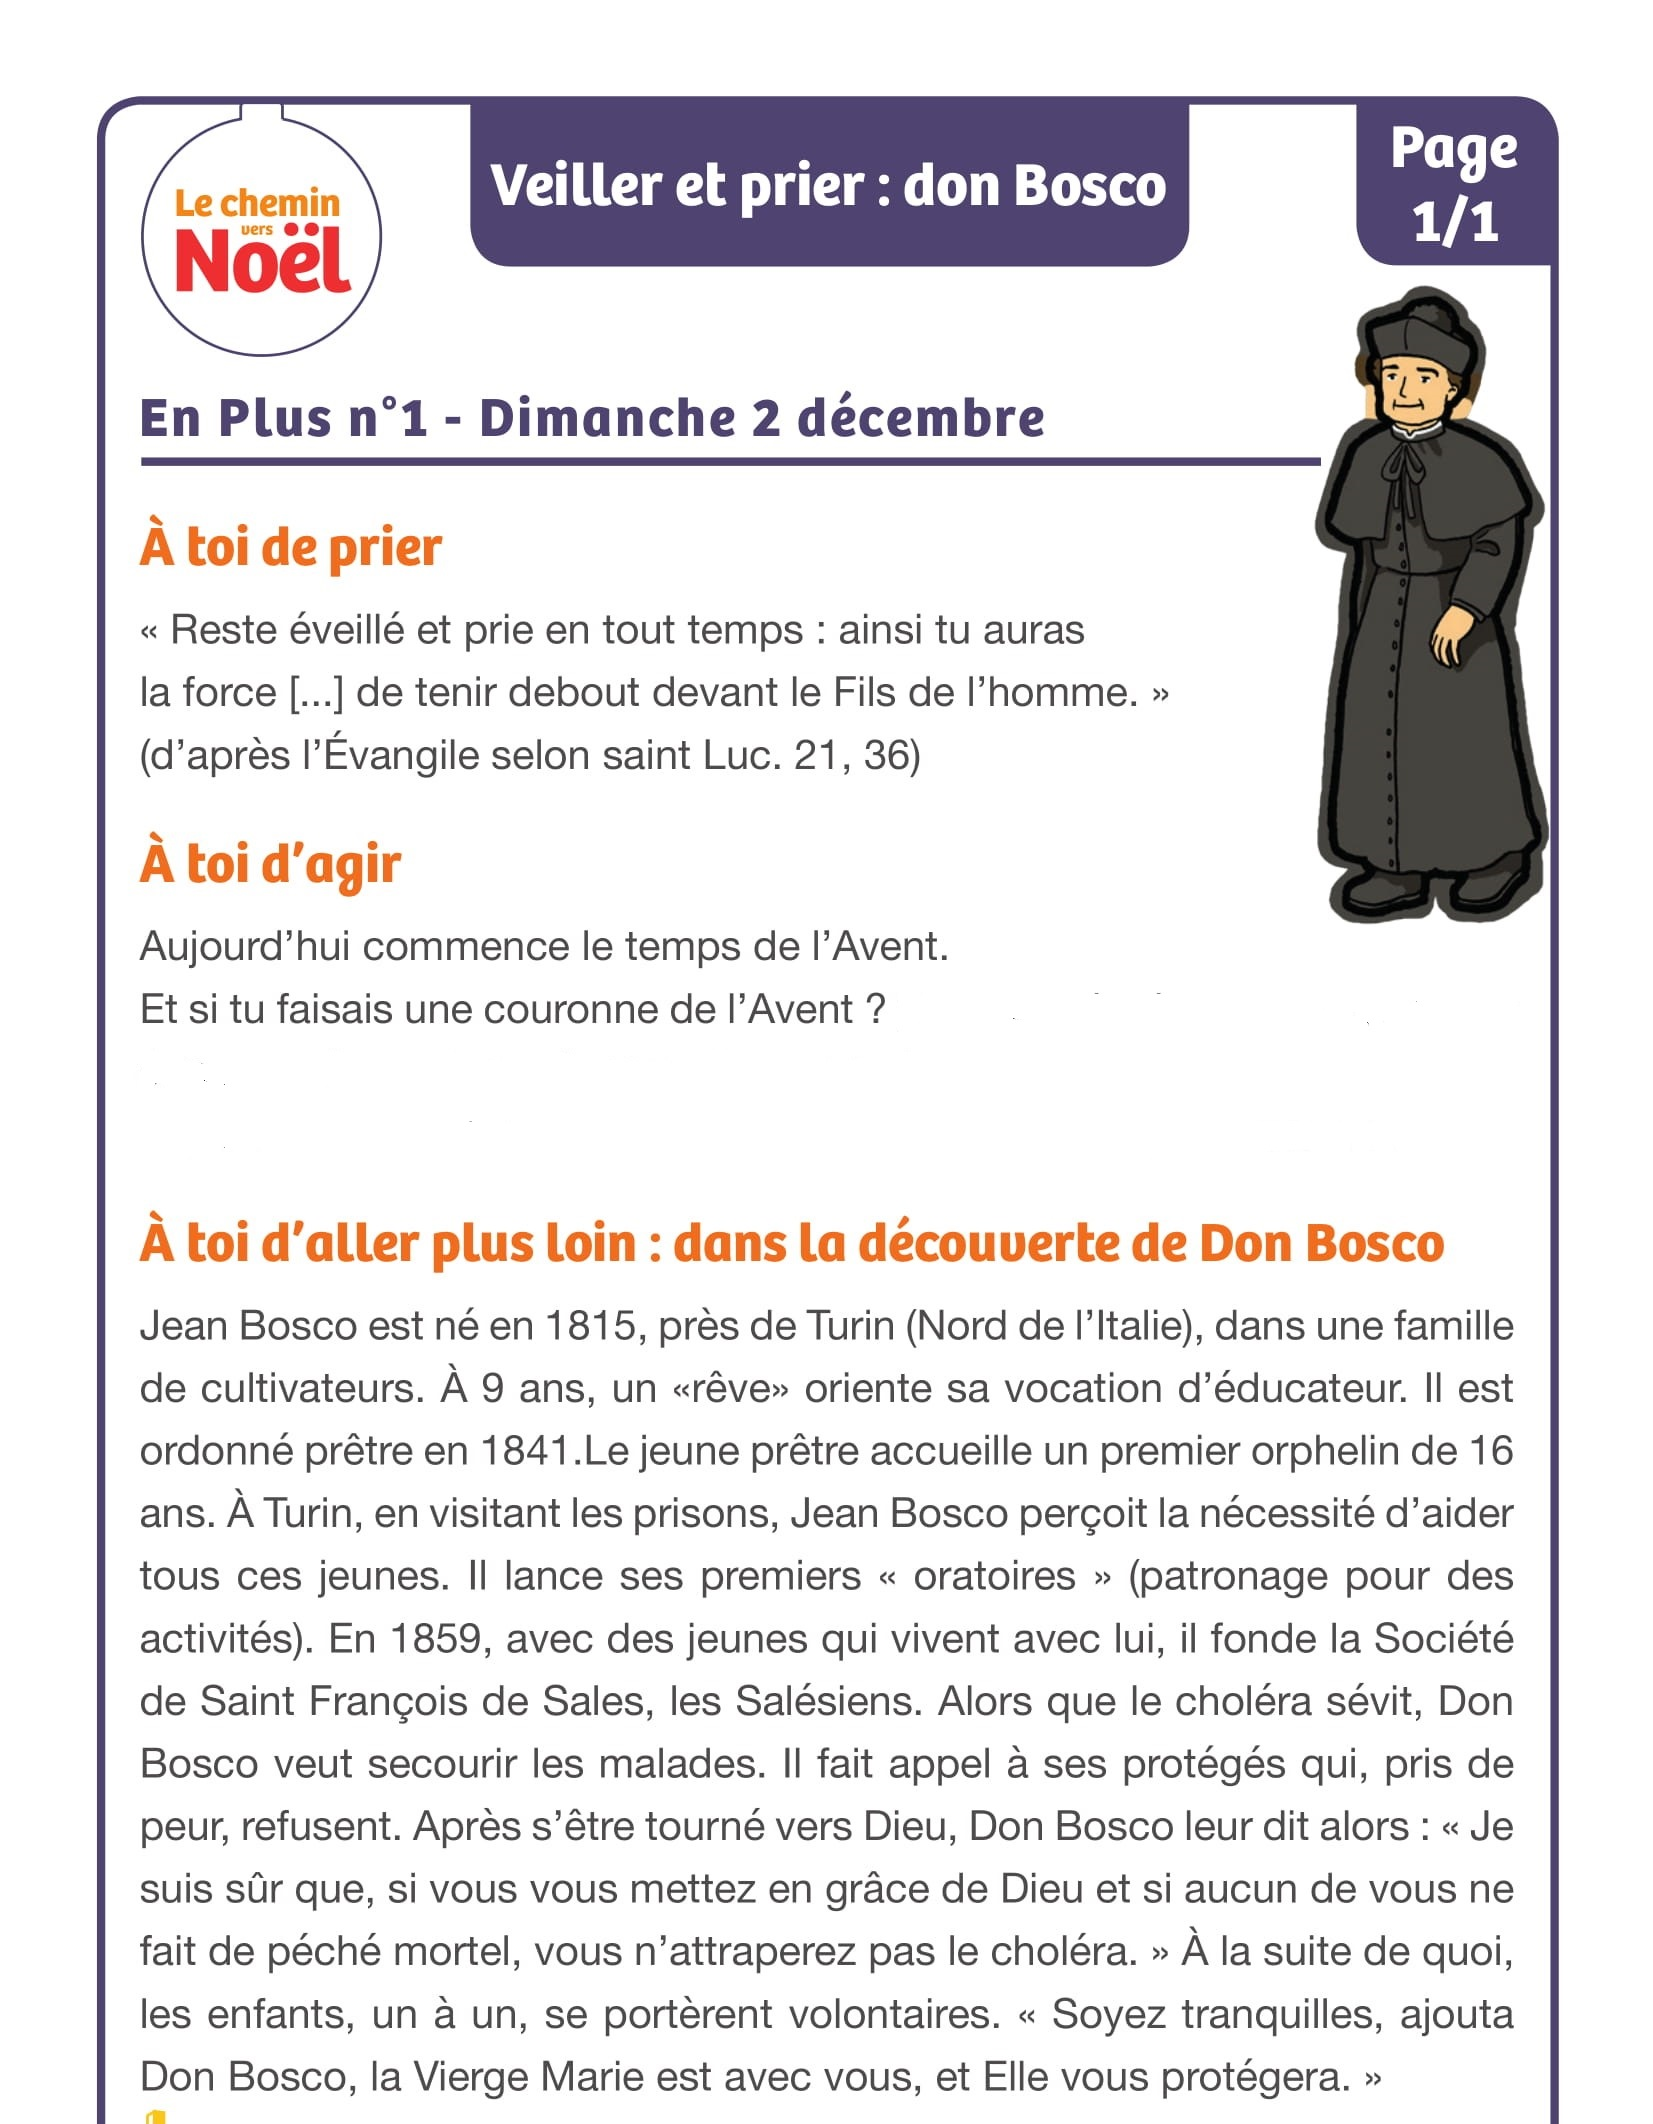 Chemin D'angers L'eglise NoëlDiocèse EnsembleEn Vers AL435Rjq